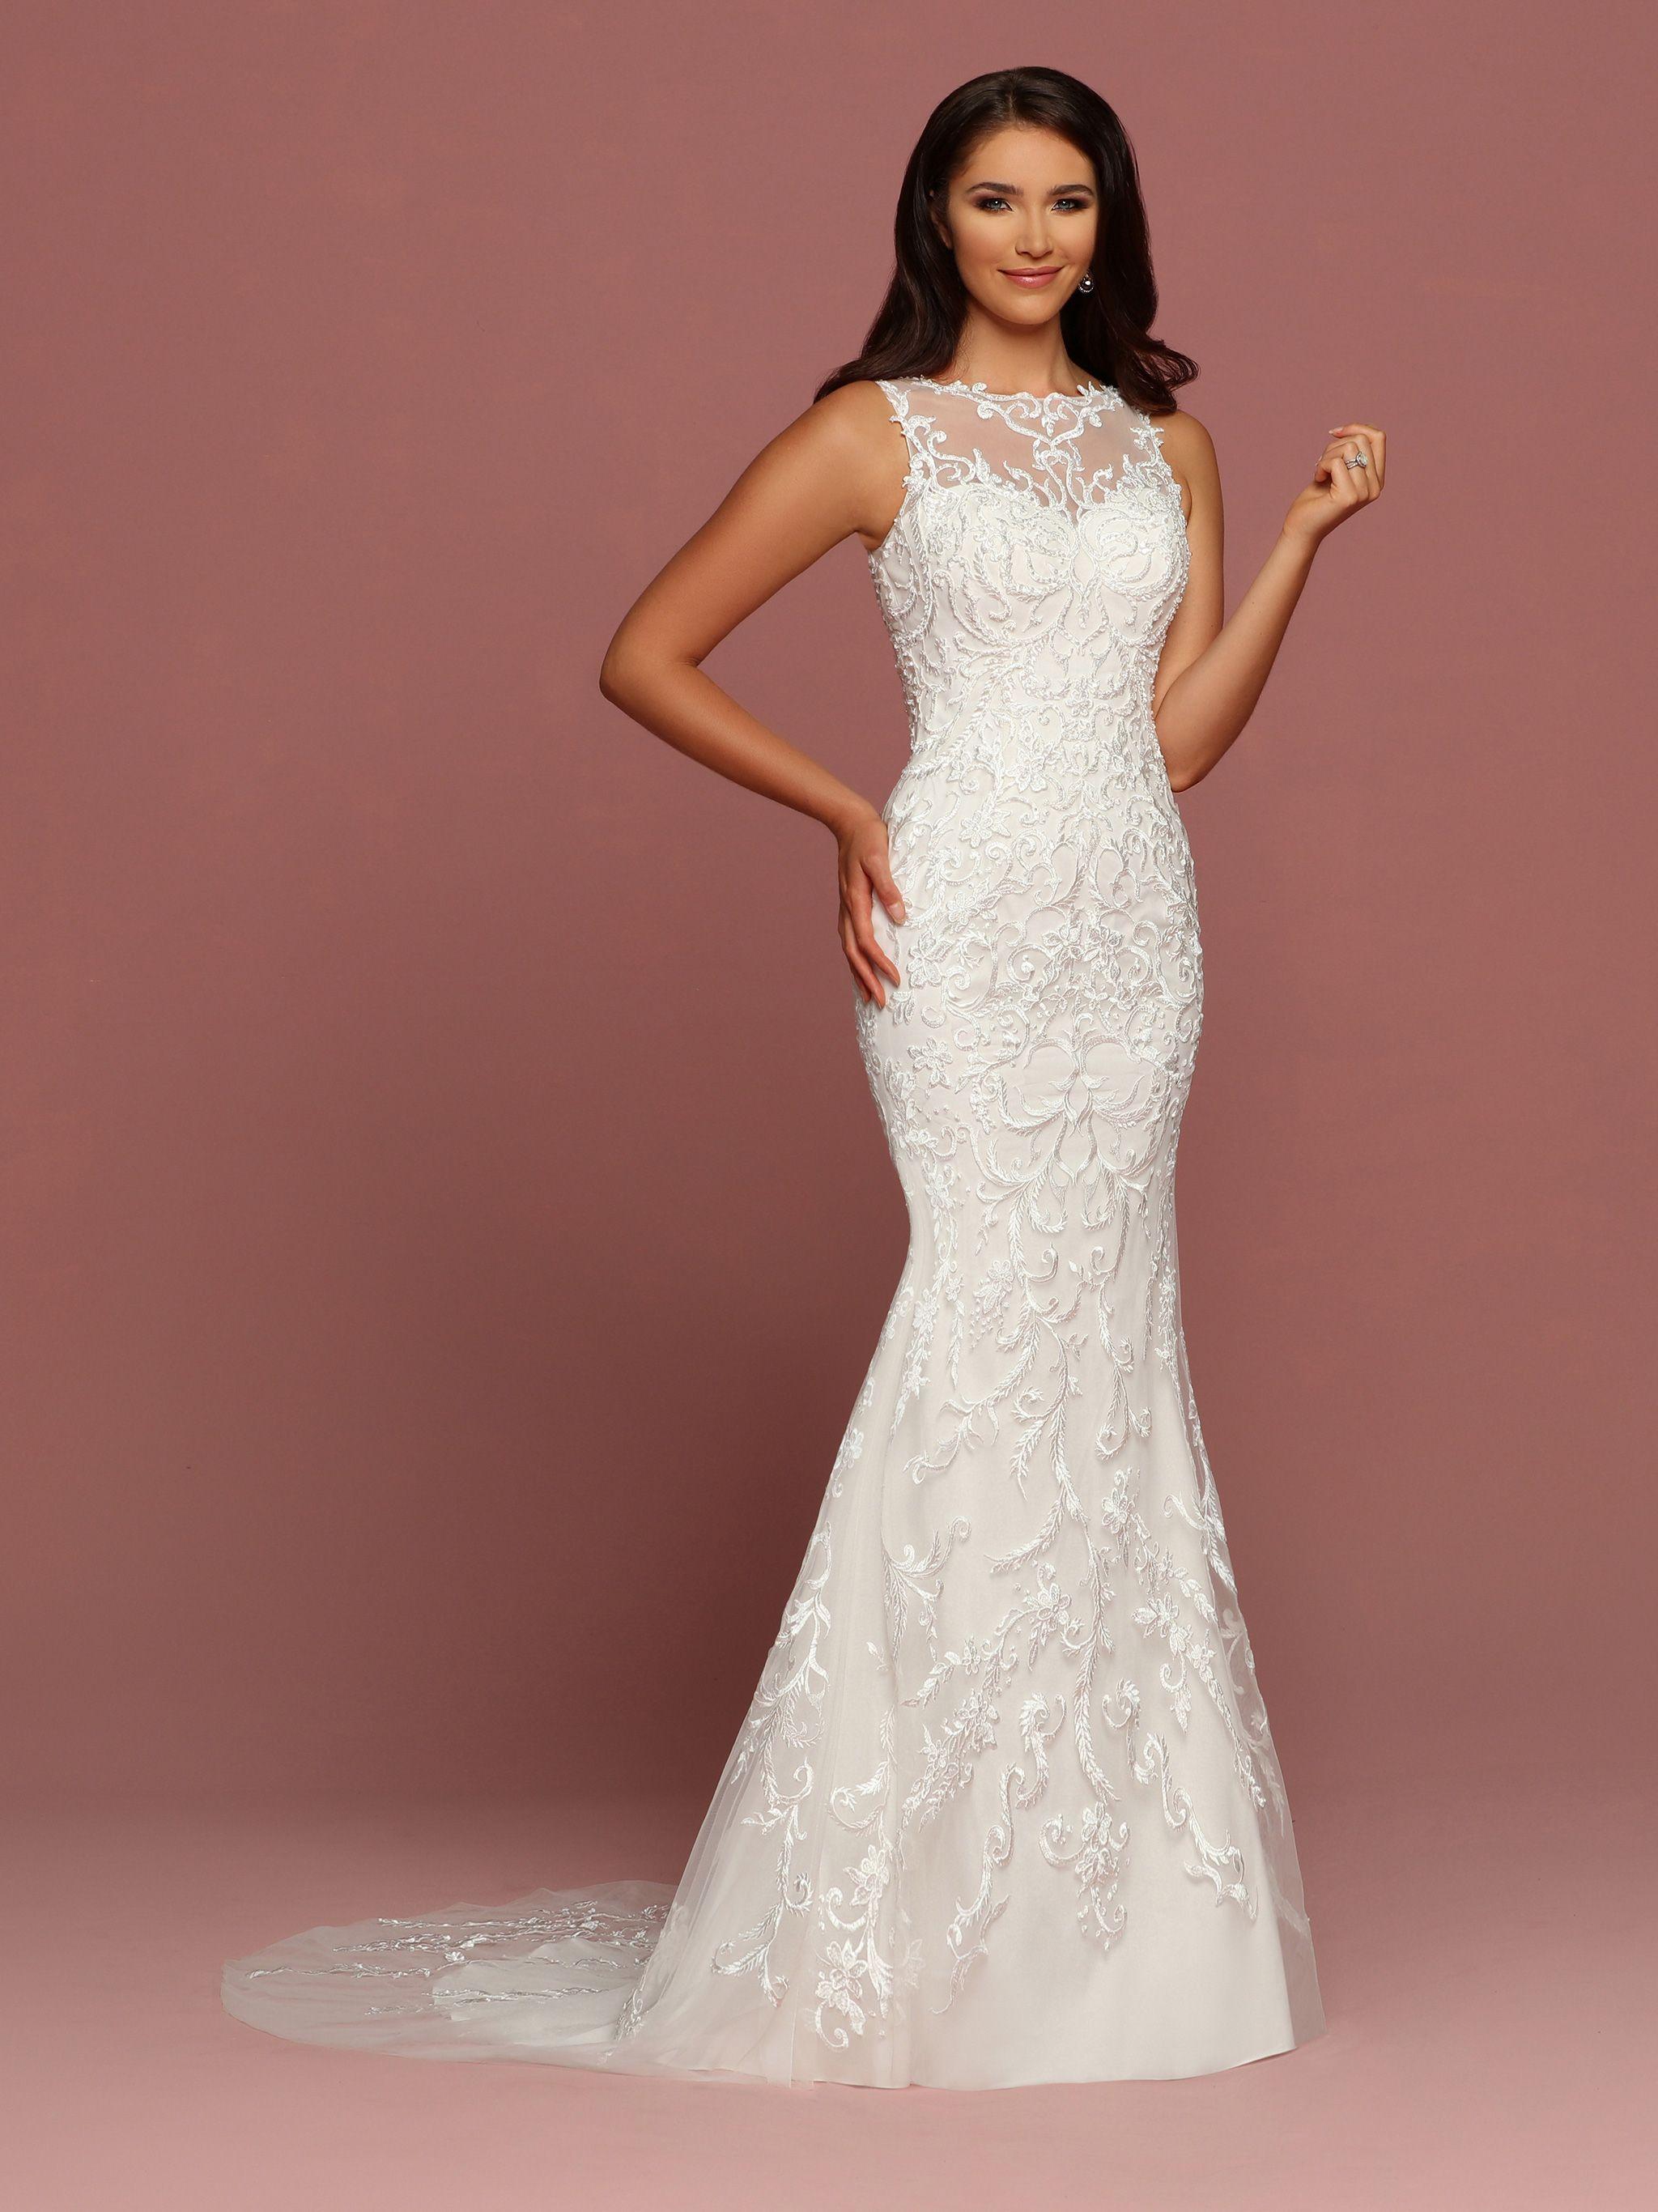 Wedding Gown Style #50481 | 2018 DaVinci Bridal | Pinterest ...